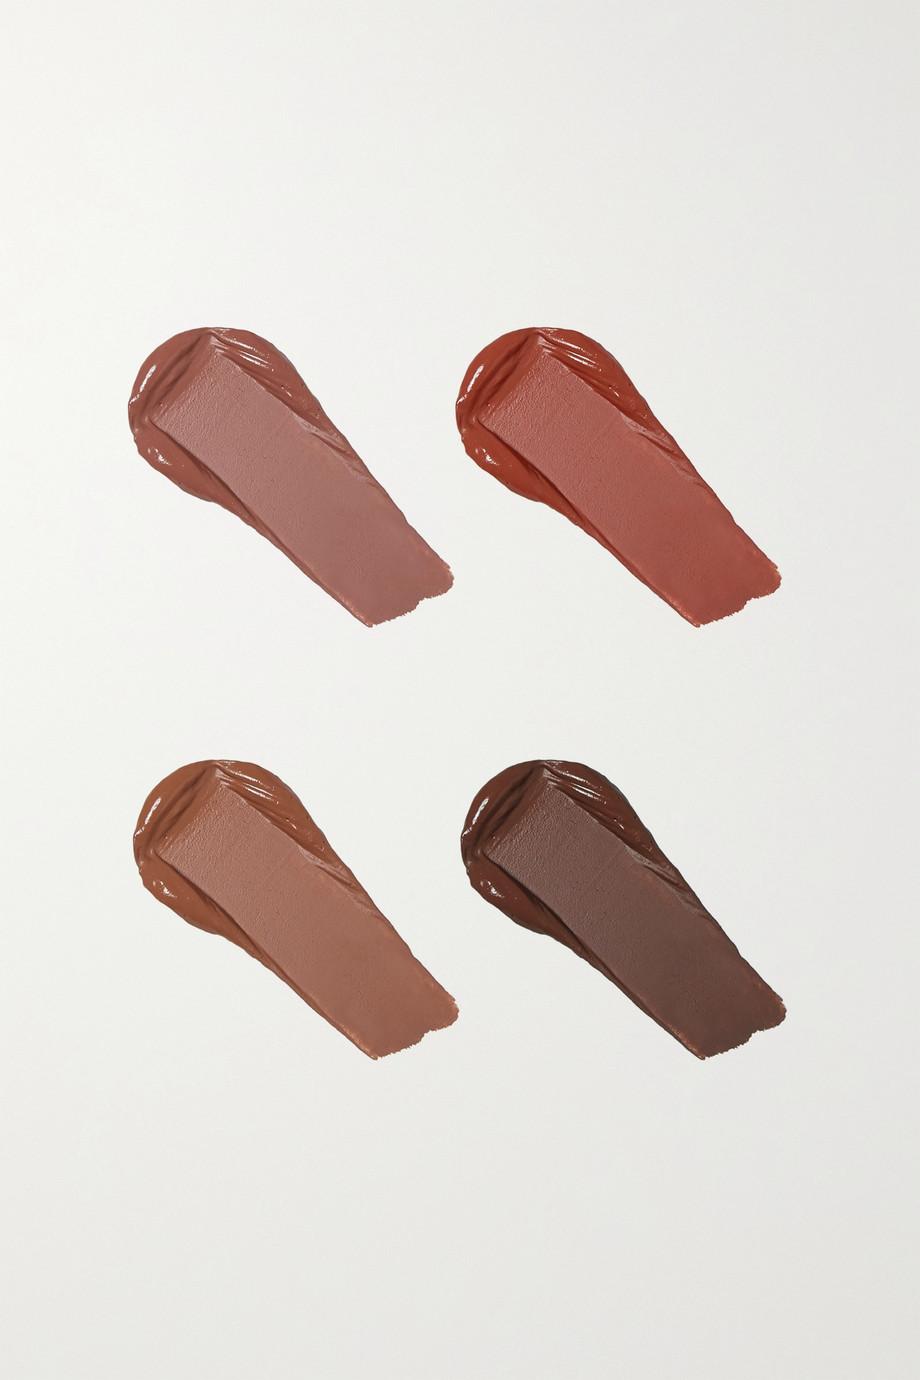 Huda Beauty Brown Obsessions Liquid Matte Mini Lipstick Set – Lippenstiftset